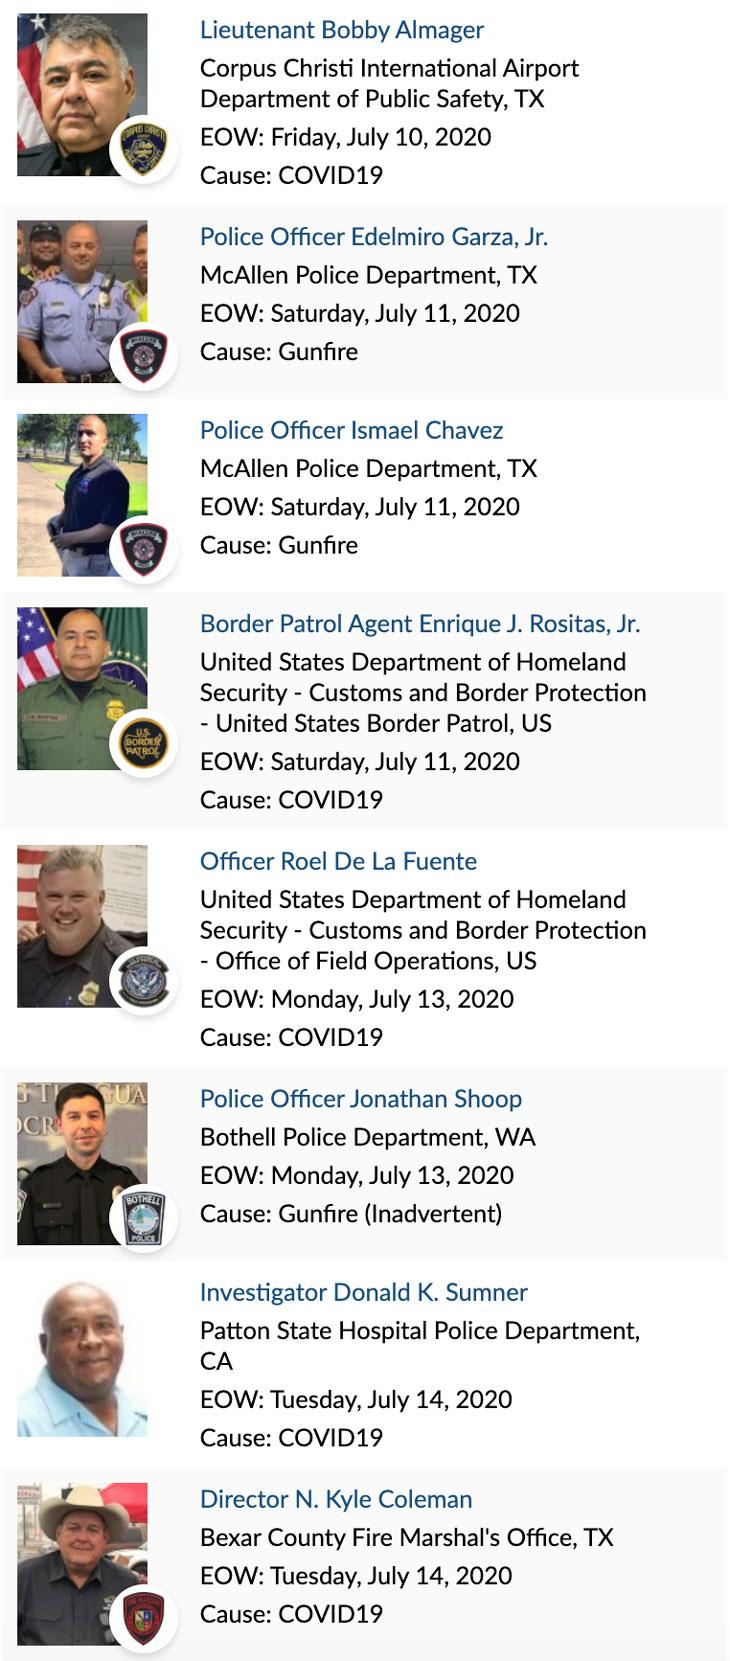 Officer Memorial 07-2020 2 of 3